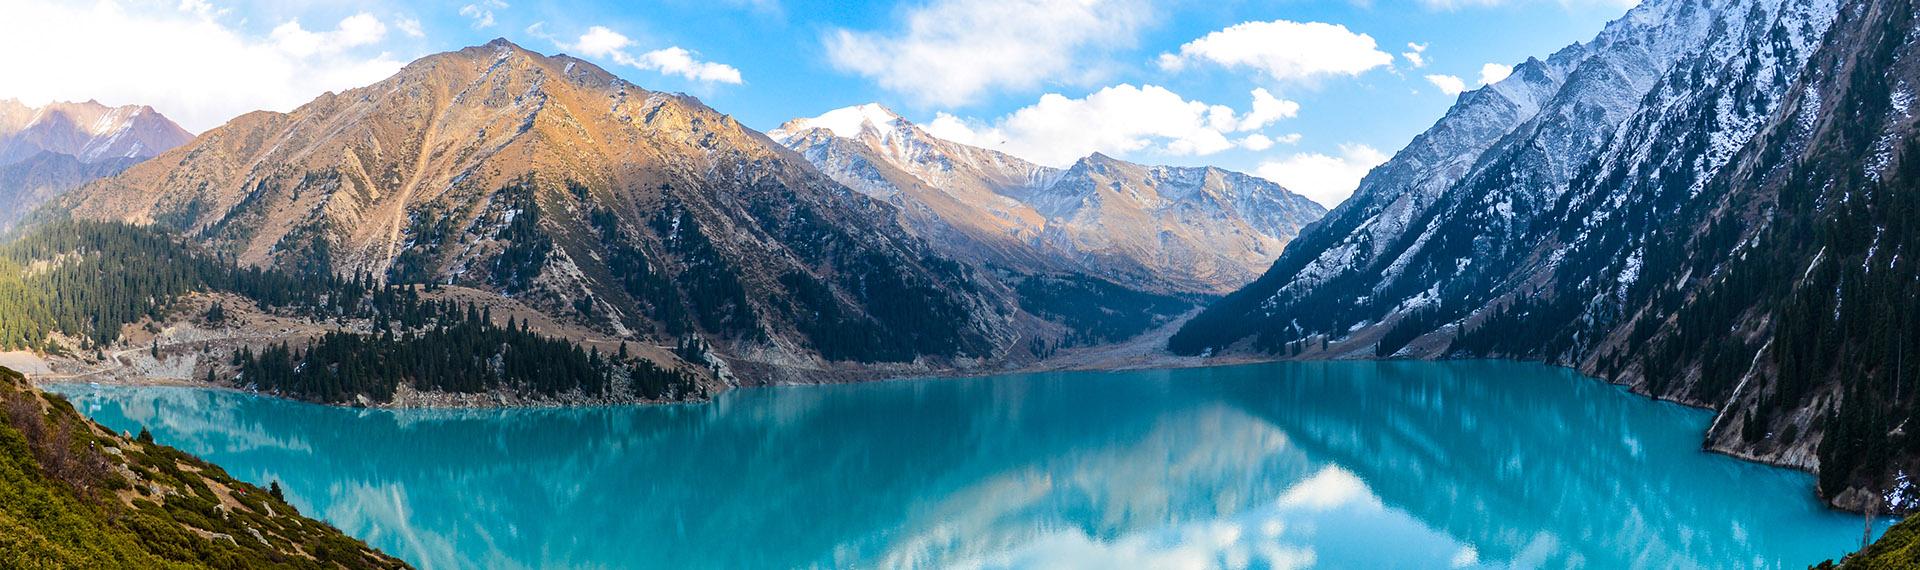 lago-e-montanha